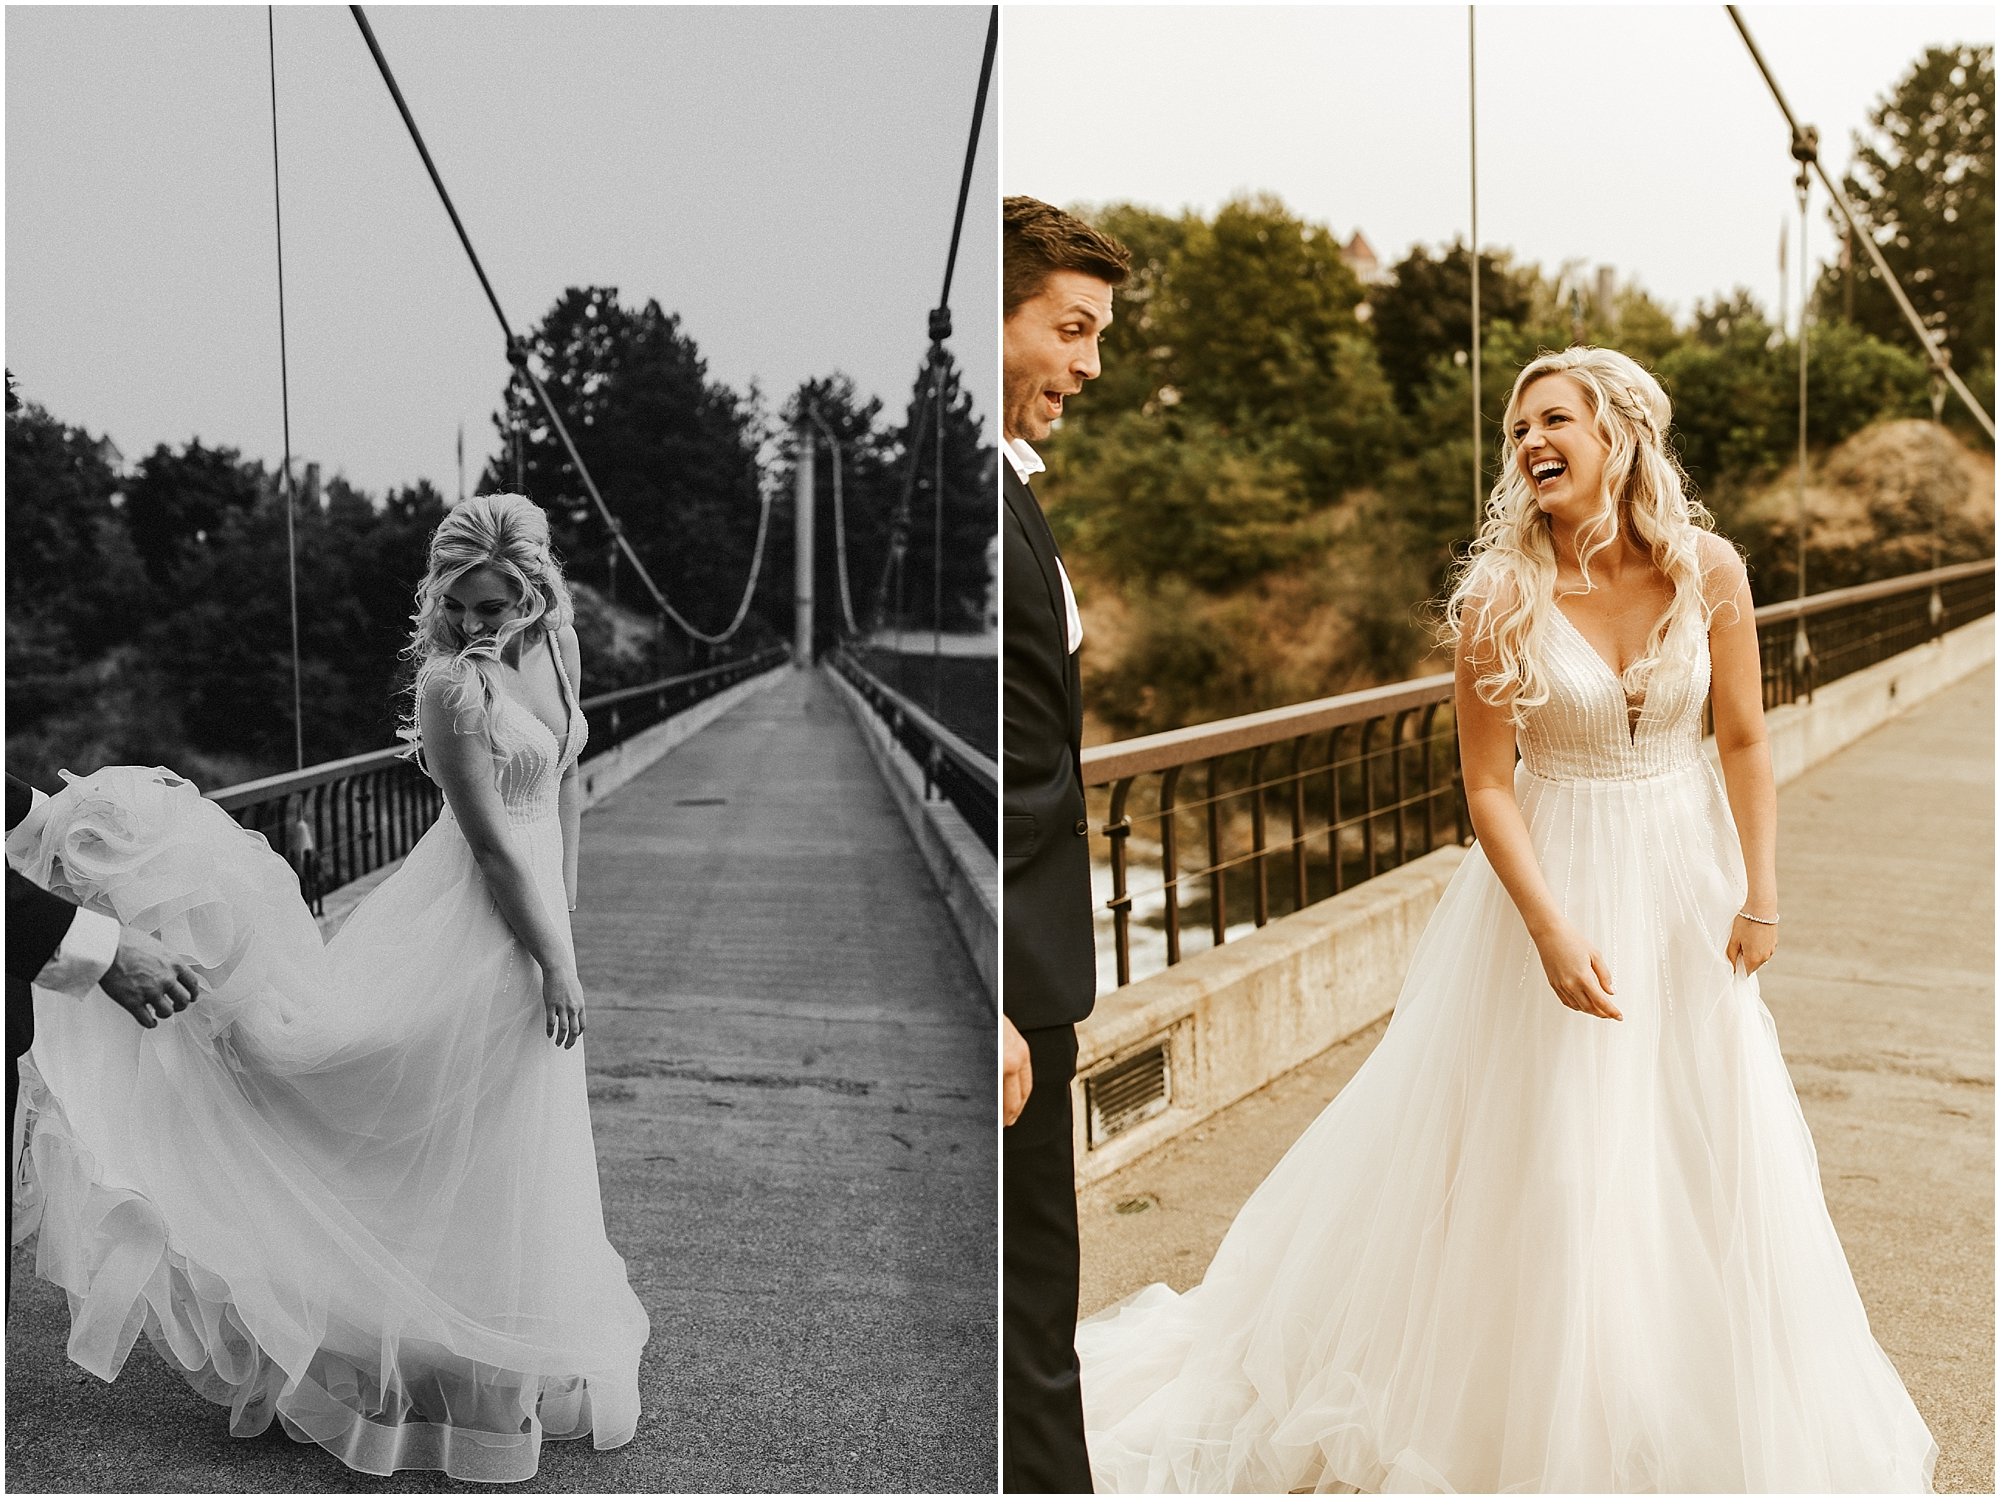 Chateau Rive Spokane Wedding Cassie Trottier Photography1049.jpg